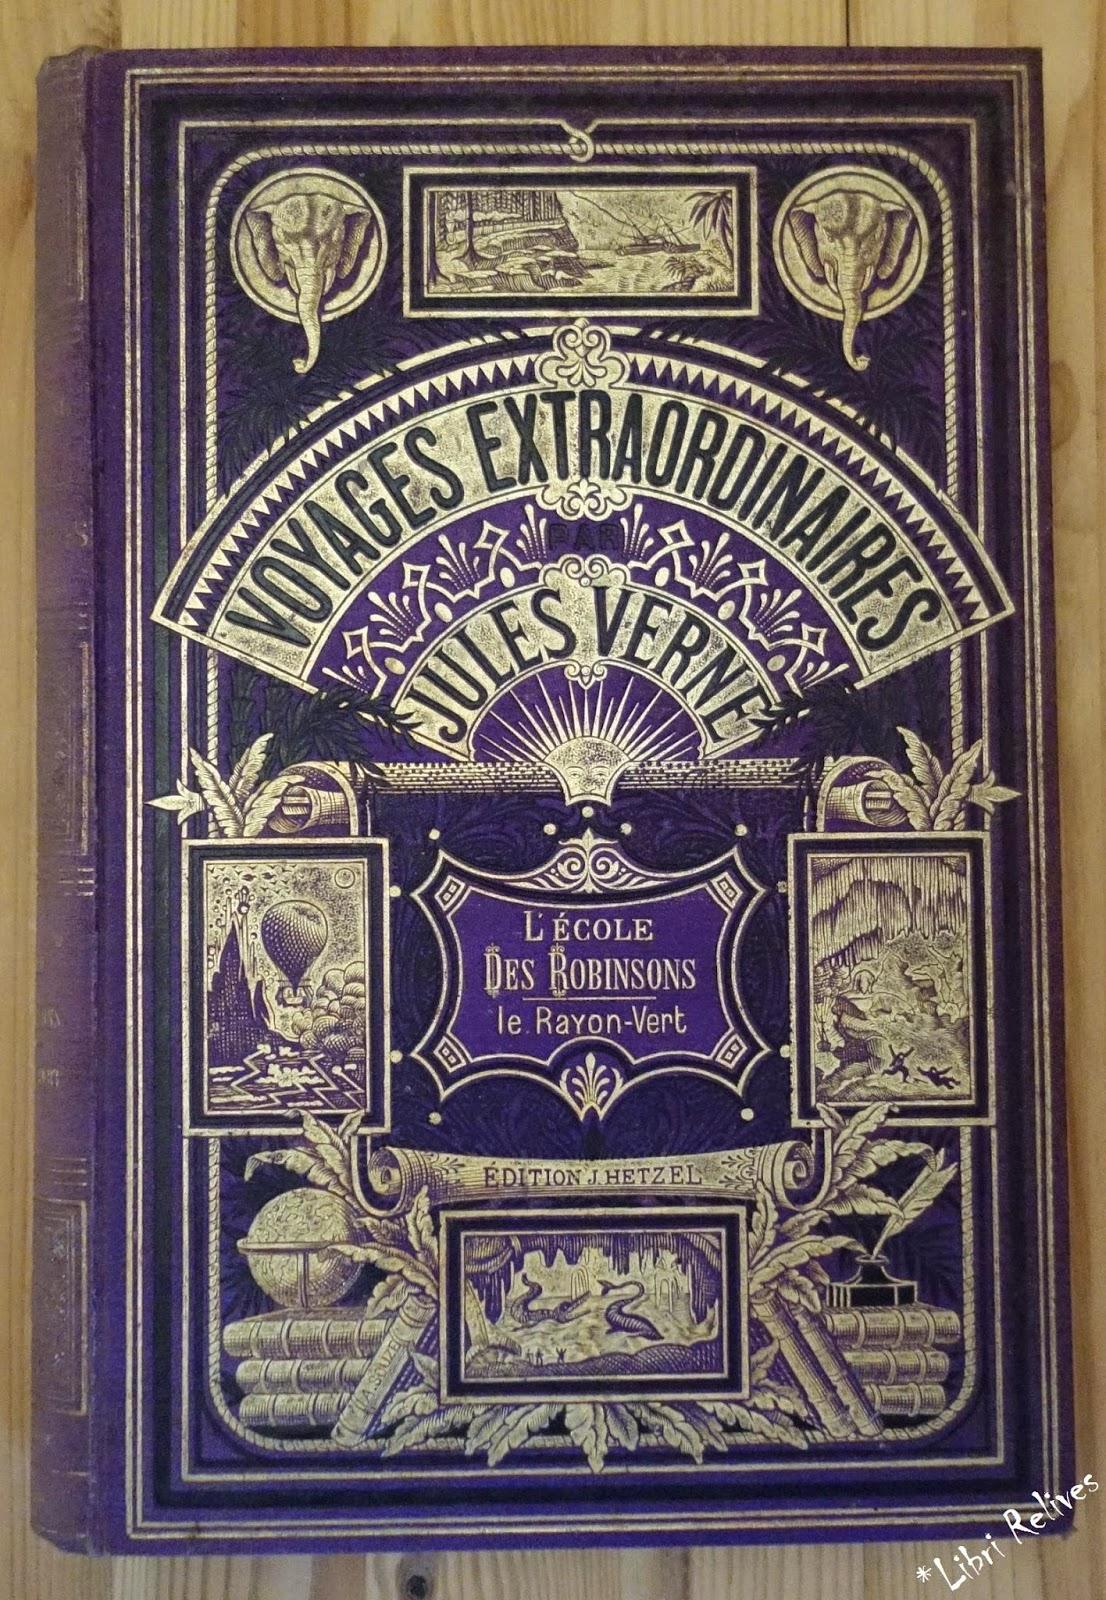 http://www.ebay.fr/itm/VERNE-Lecole-Robinsons-Rayon-Vert-dessins-Benett-HETZEL-aux-2-elephants-/281484551026?pt=FR_GW_Livres_BD_Revues_LivresAnciens&hash=item4189c96372